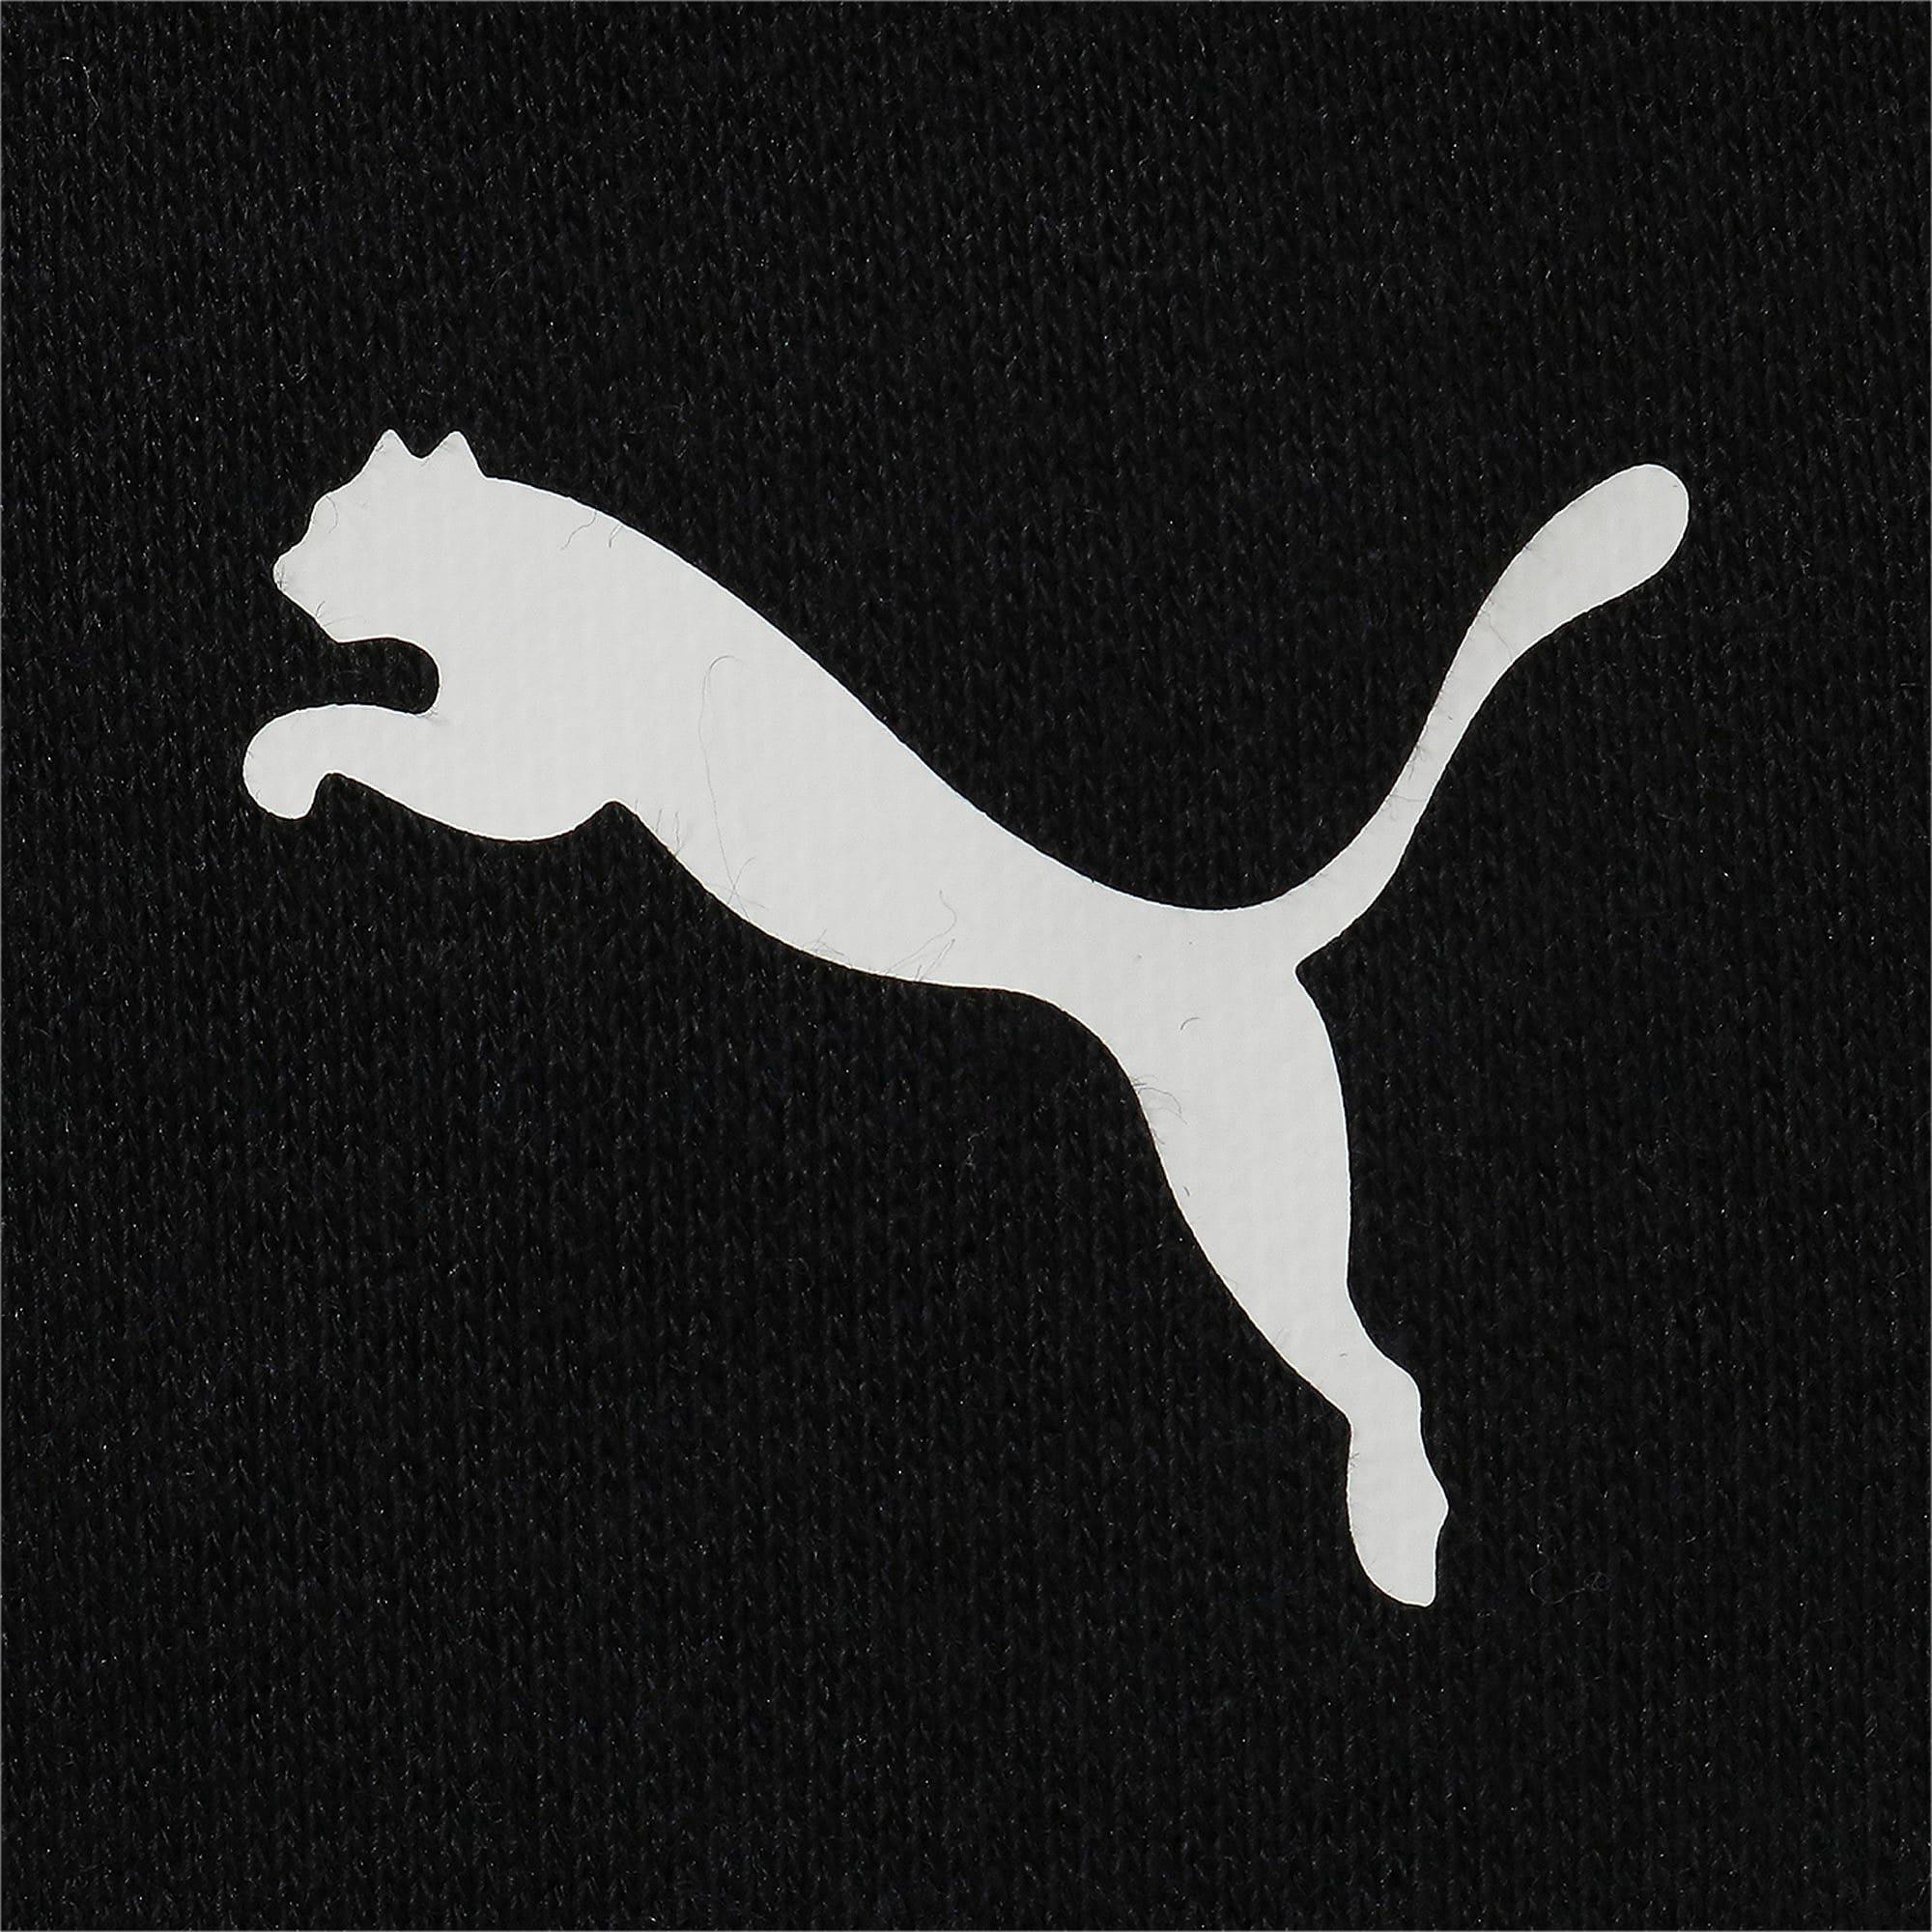 Thumbnail 4 of キッズ アルファ スウェット パンツ FL, Puma Black, medium-JPN